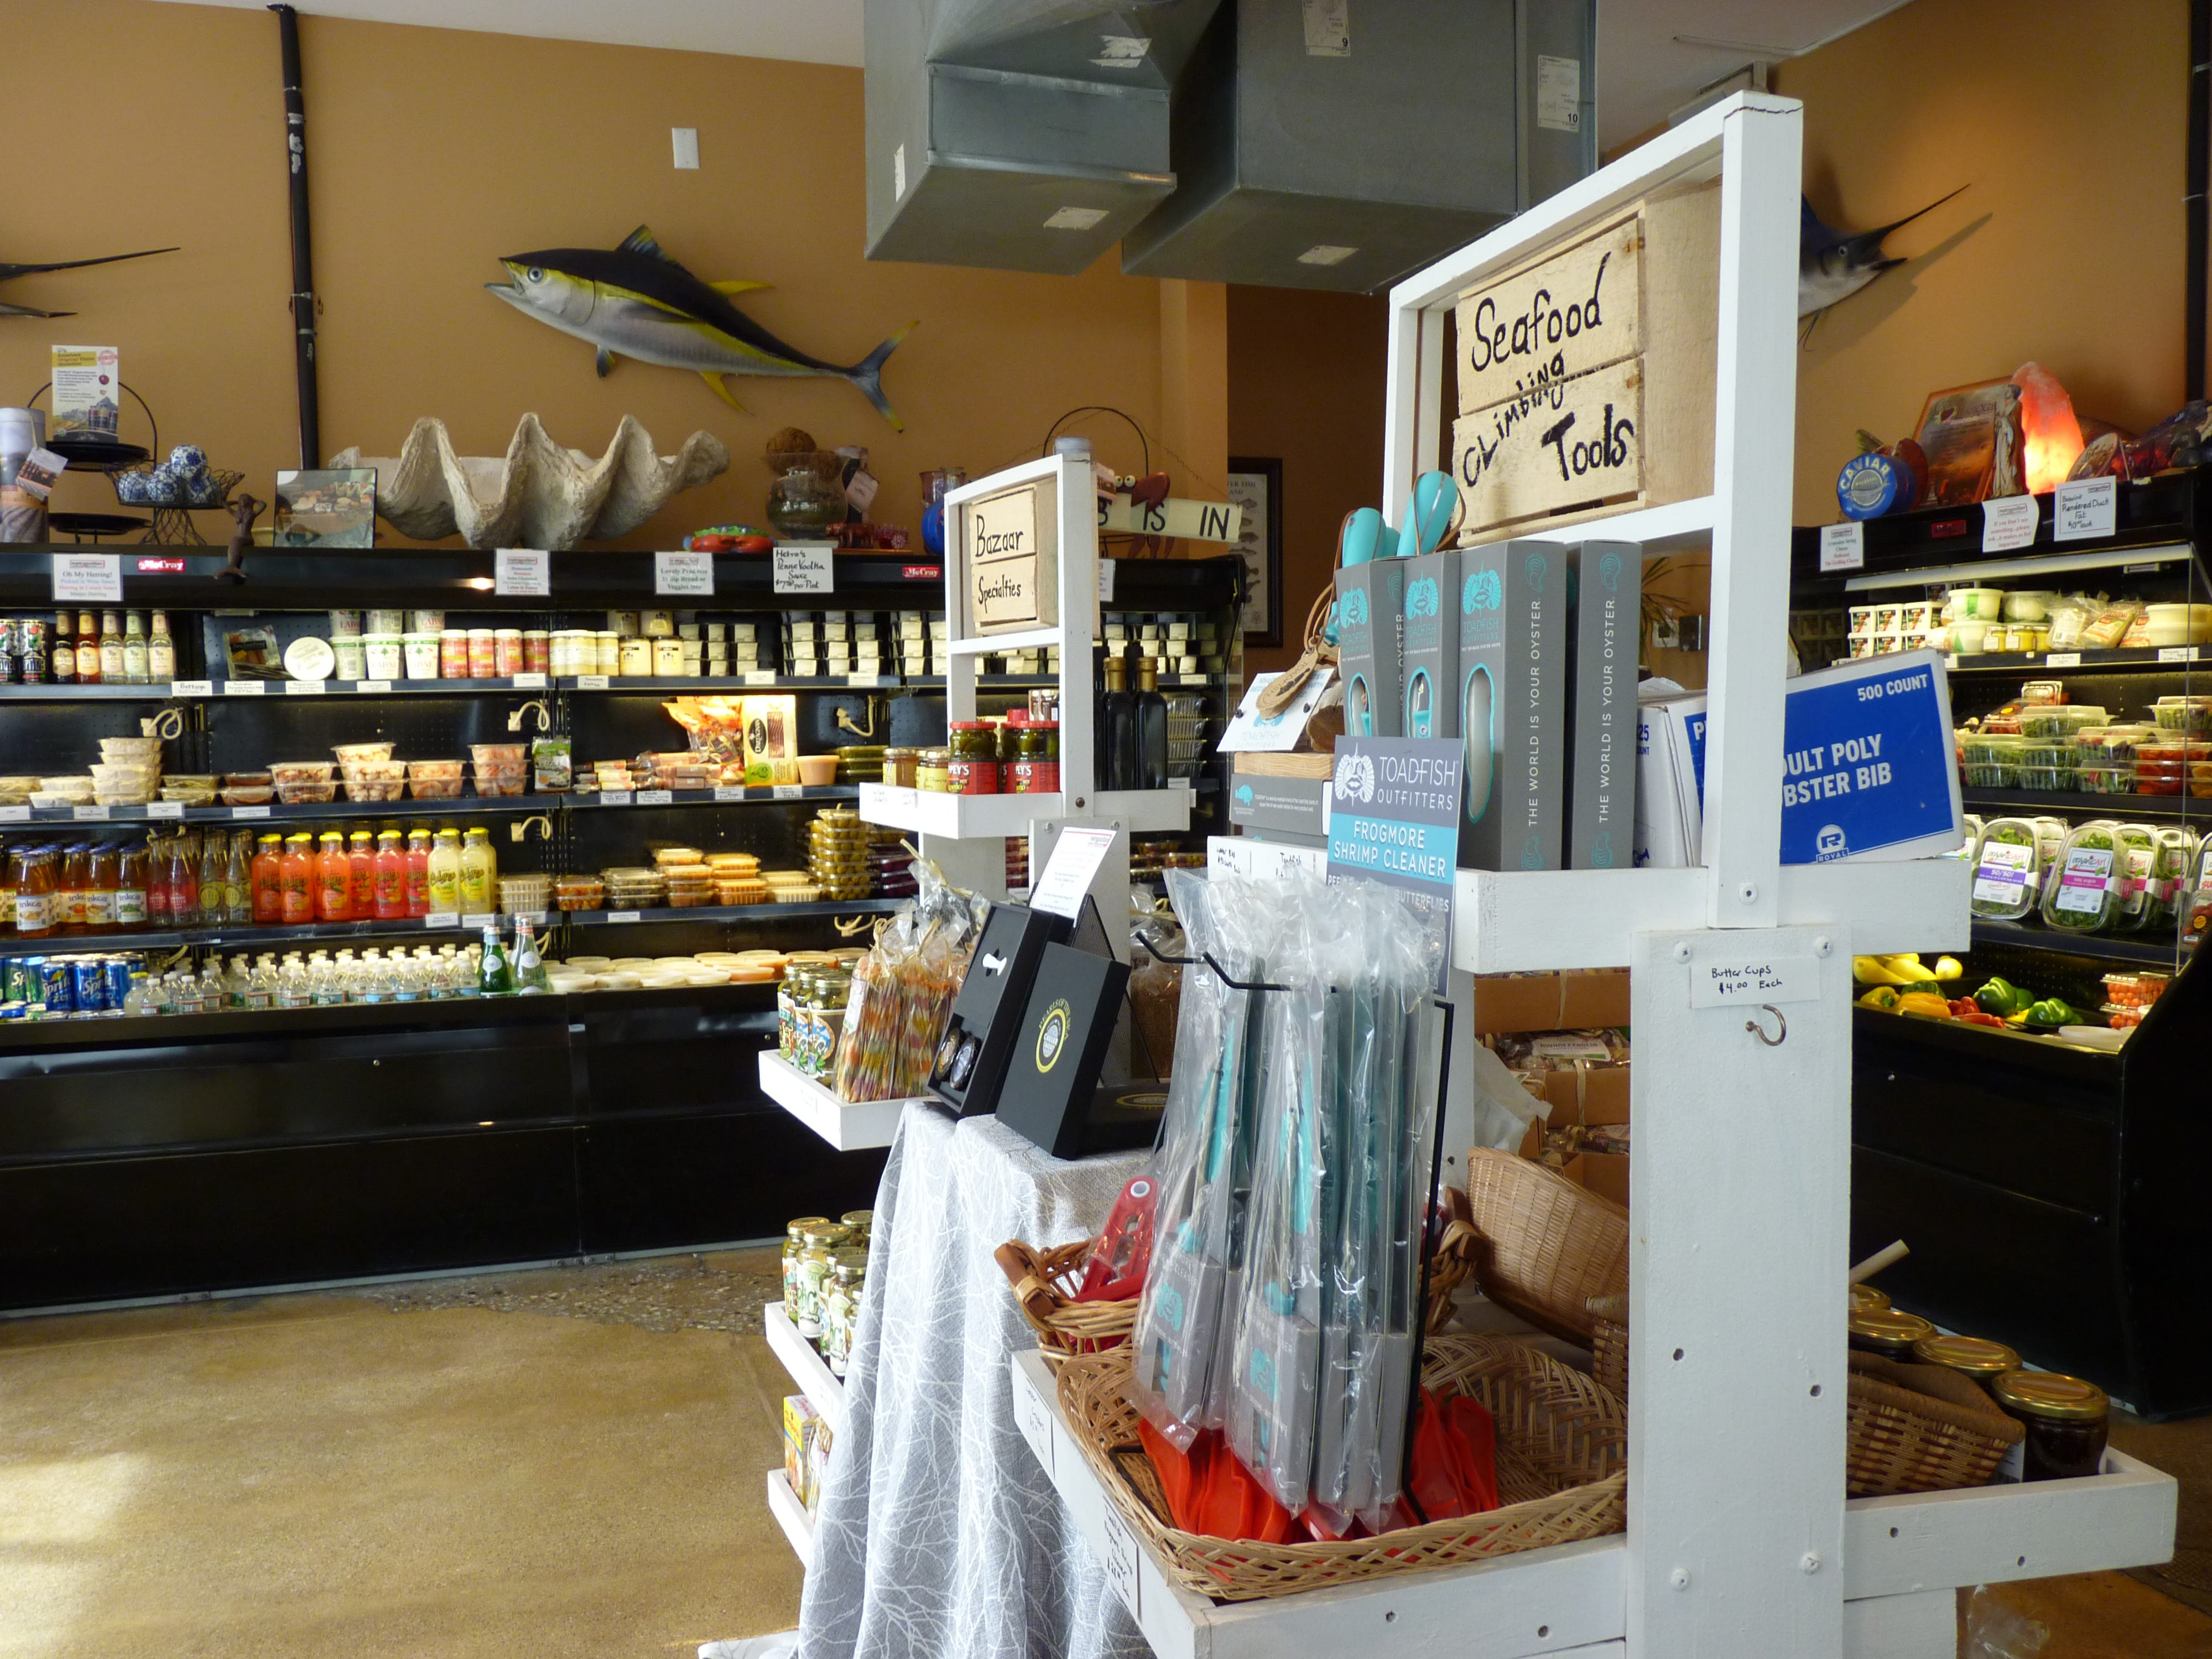 Inside Metropolitan Seafood & Gourmet in Lebanon.